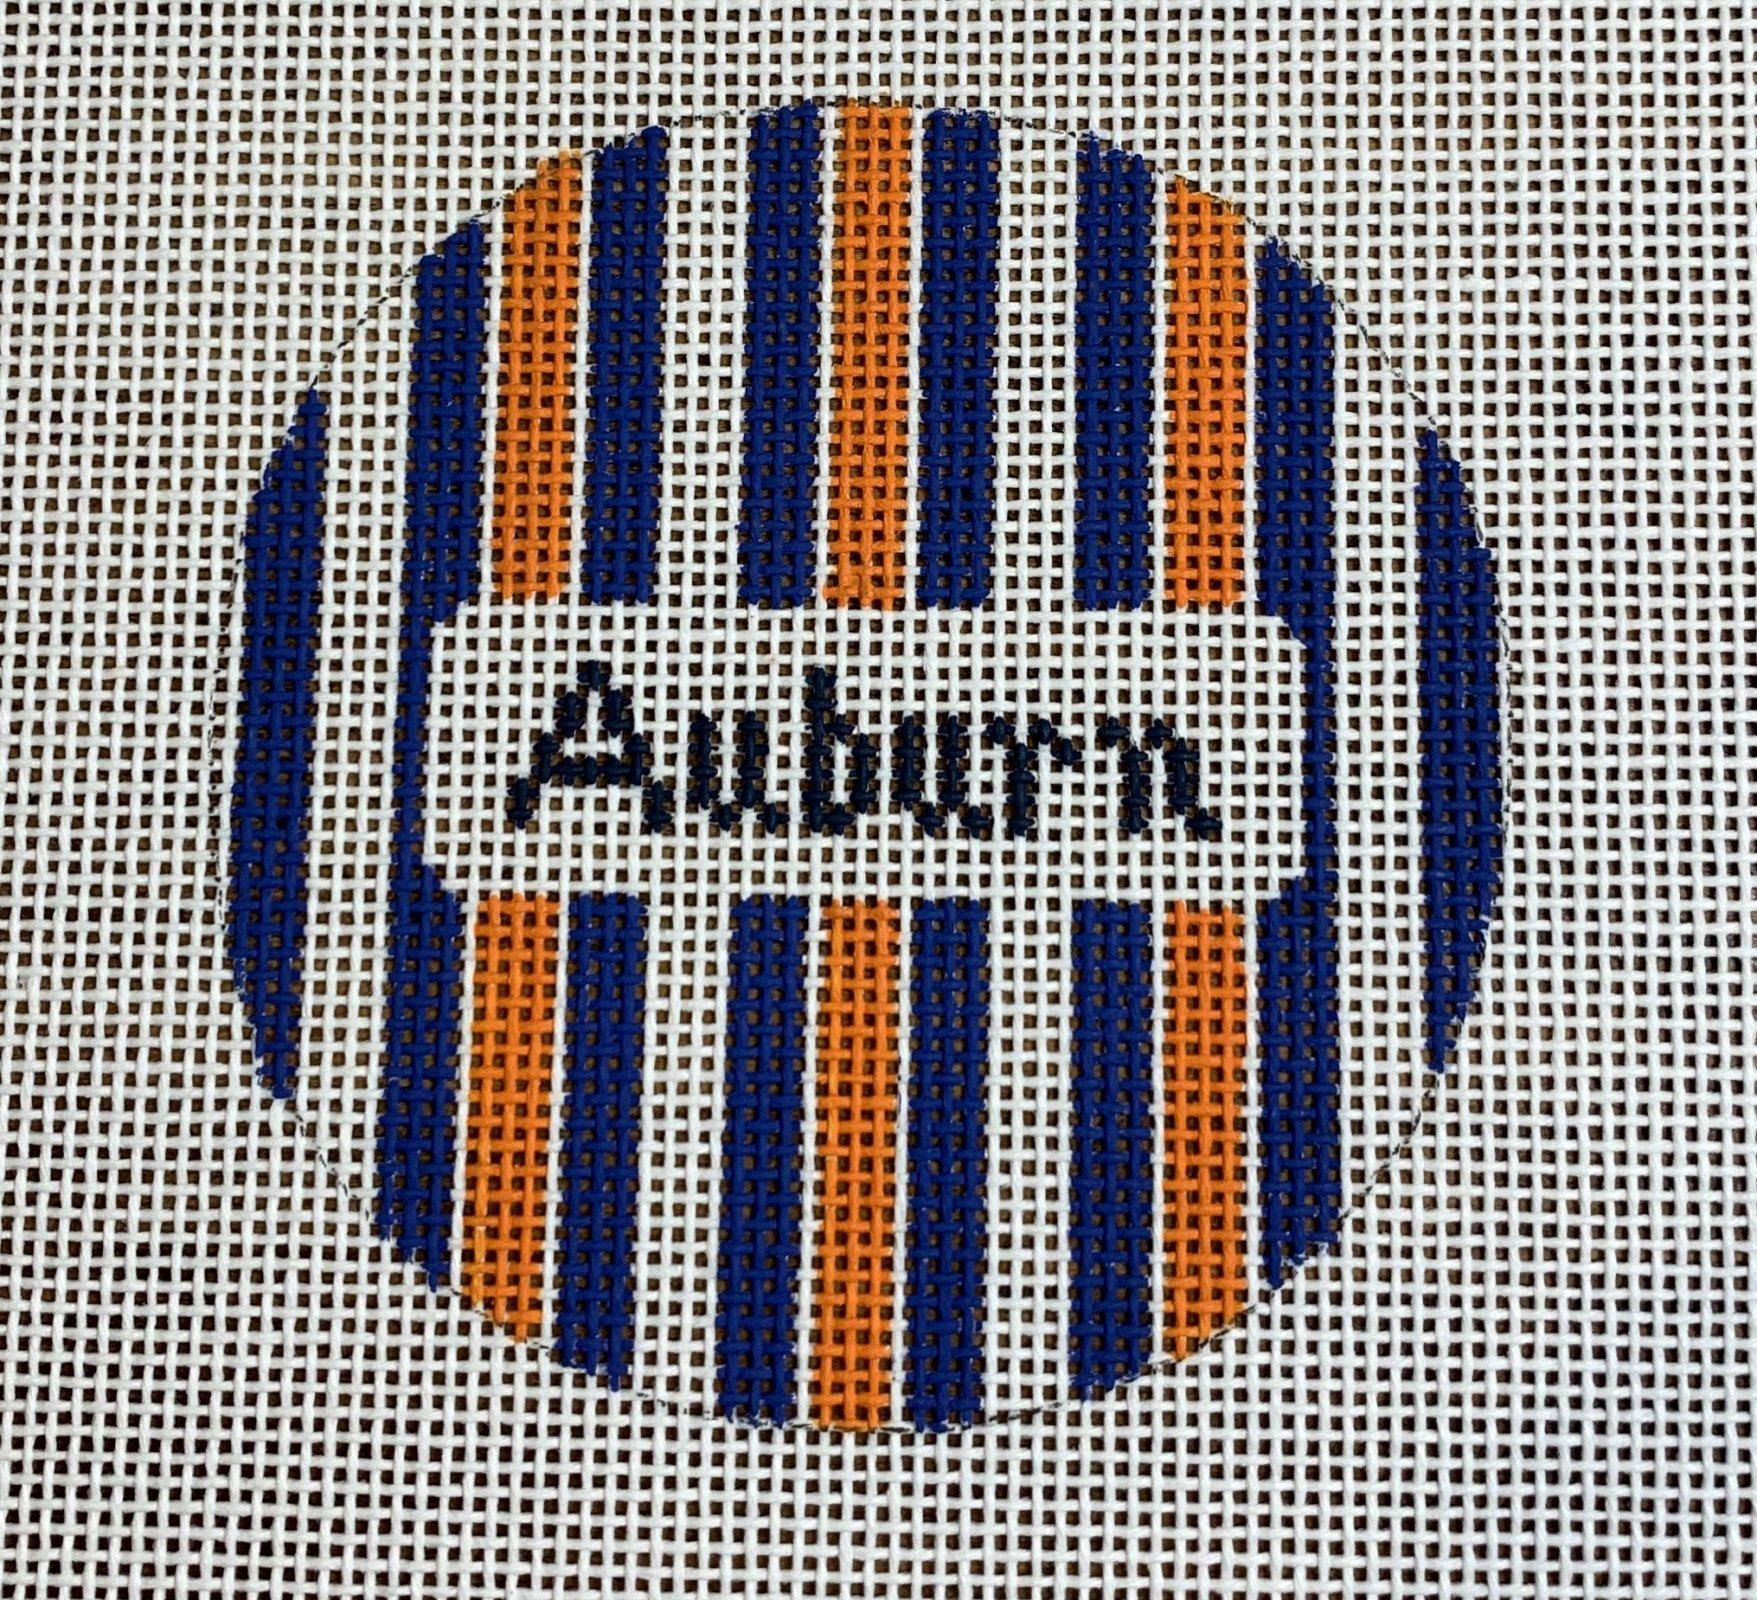 3 round with Auburn